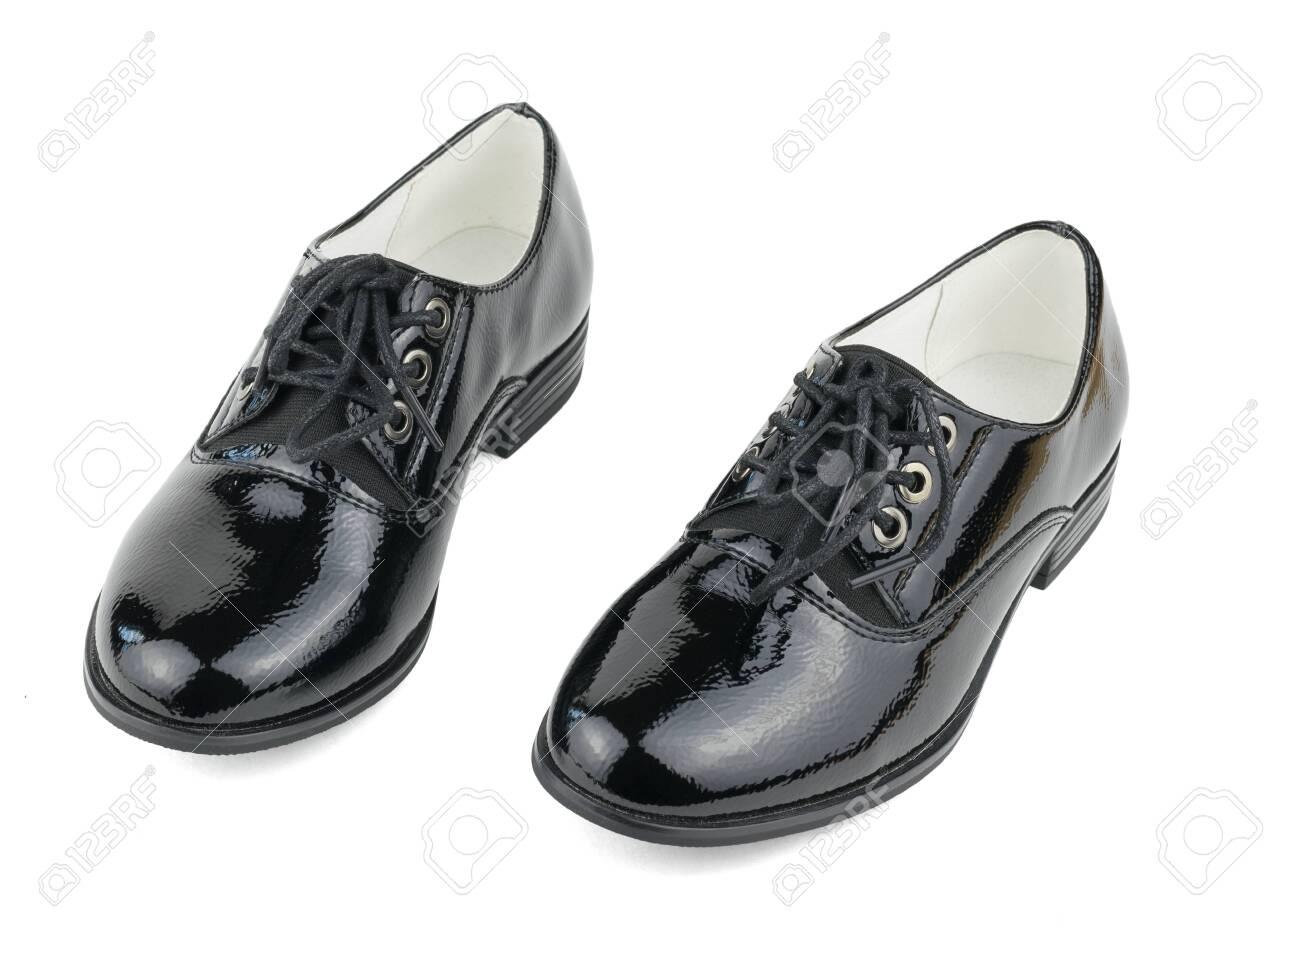 Two Fashionable Black Women's Shoes